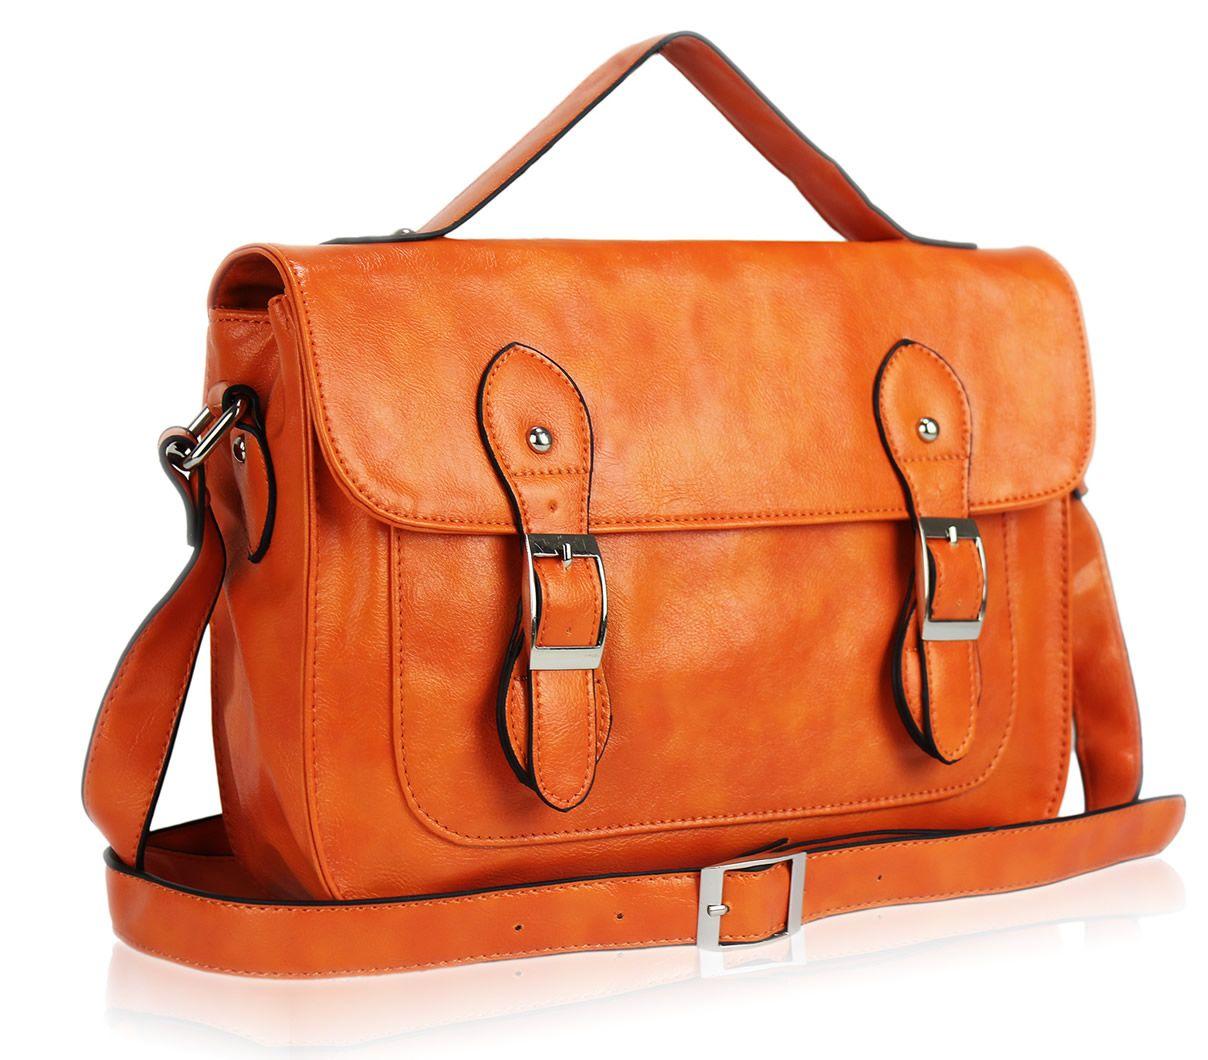 Satchel bag womens – New trendy bags models photo blog